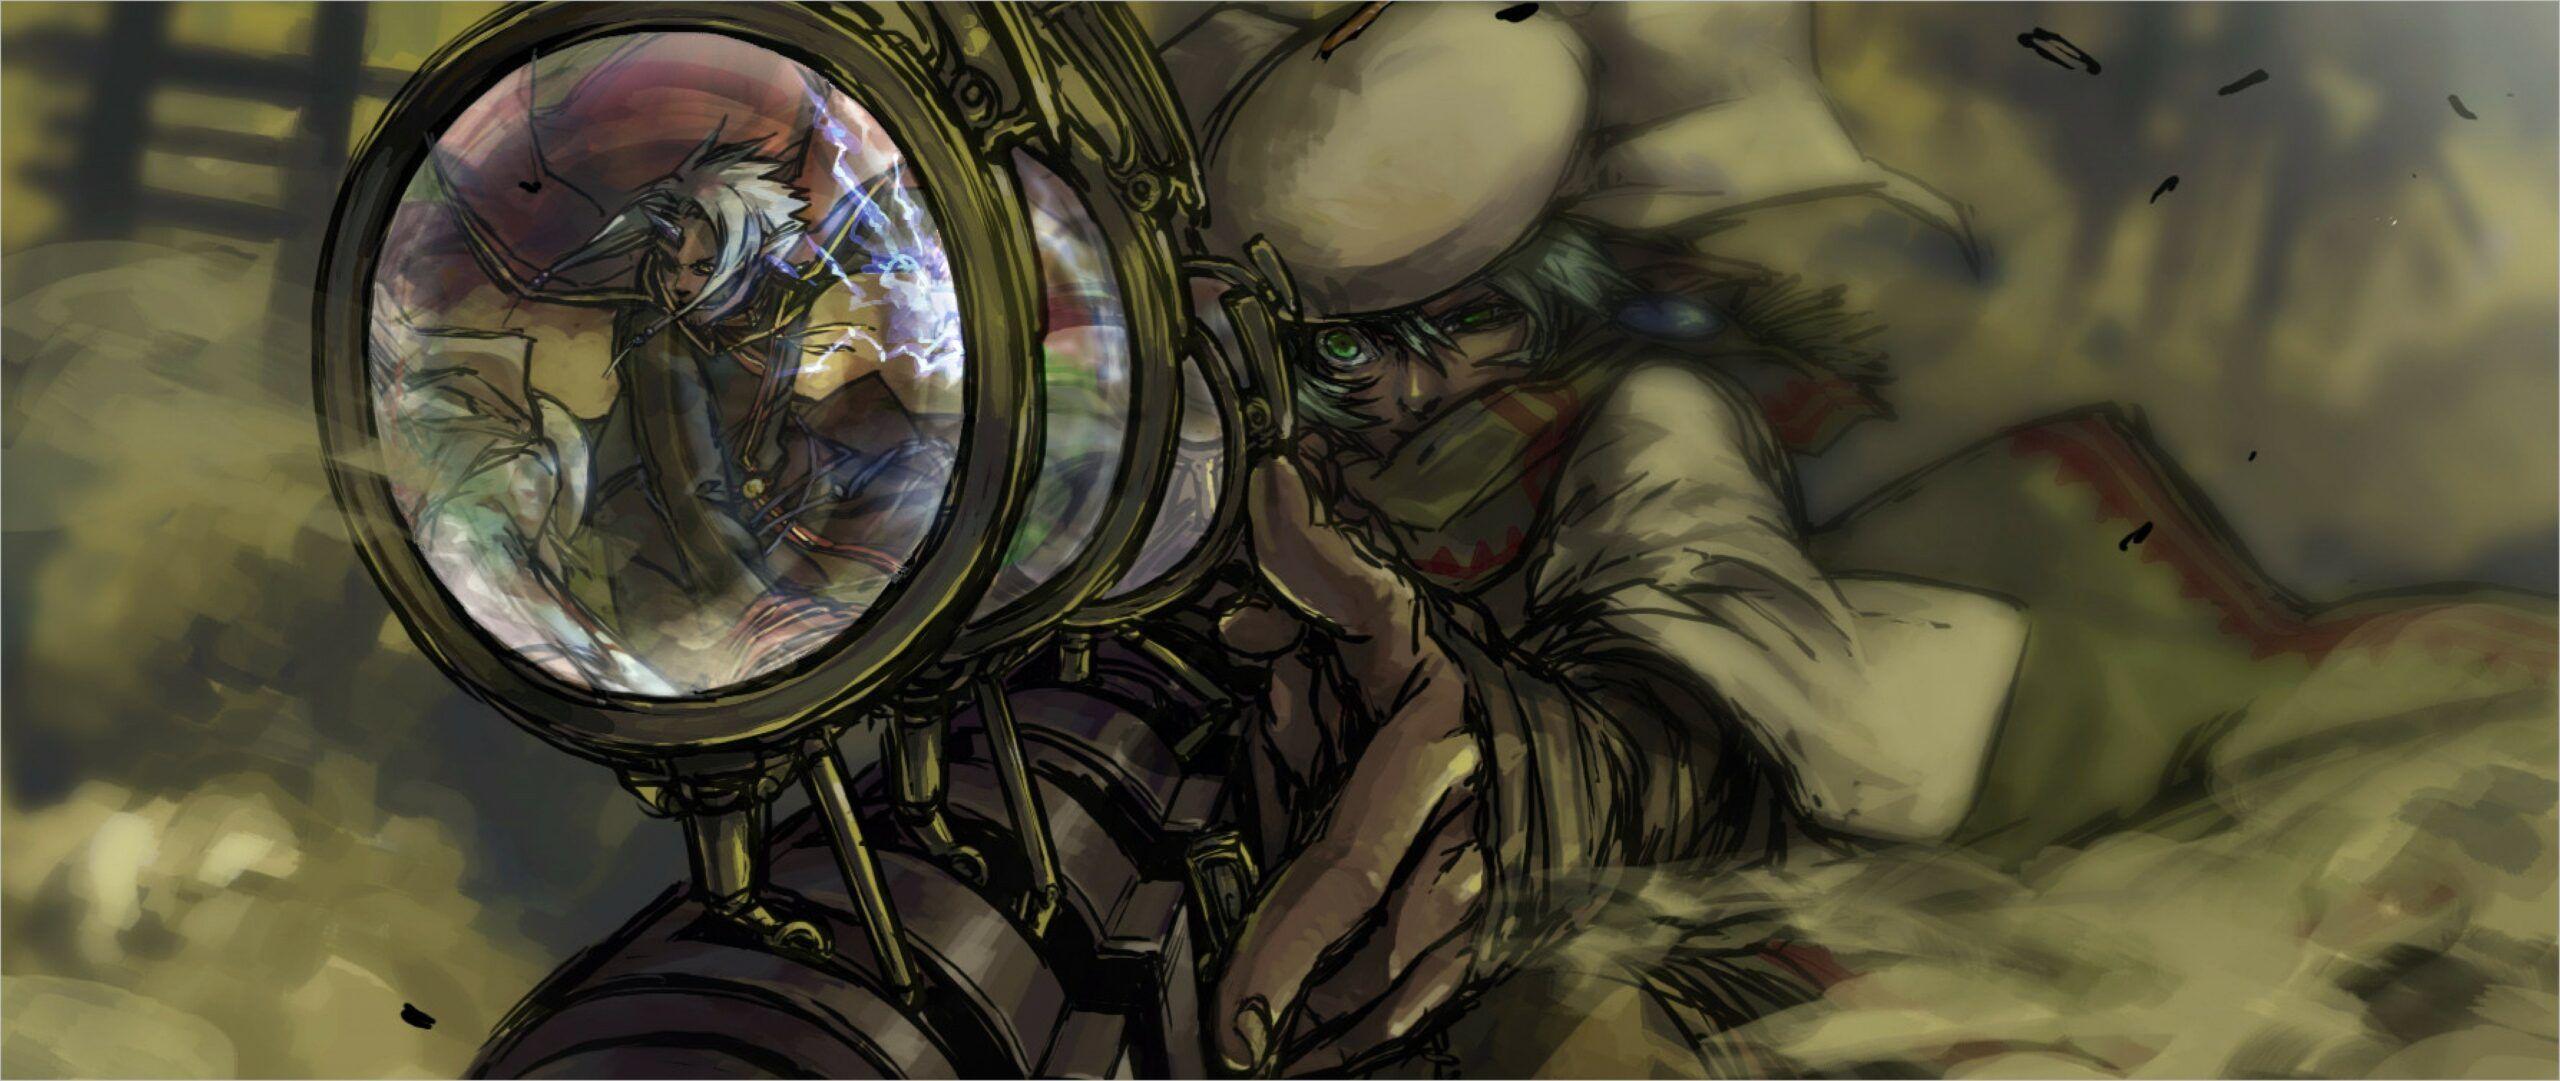 388947 Stimpank Rendering Osada Bashnya Robot Bitva Ogon 4500x3000 Www Gdefon Ru Jpg 4500 3000 Steampunk Wallpaper Steampunk City Steampunk Art